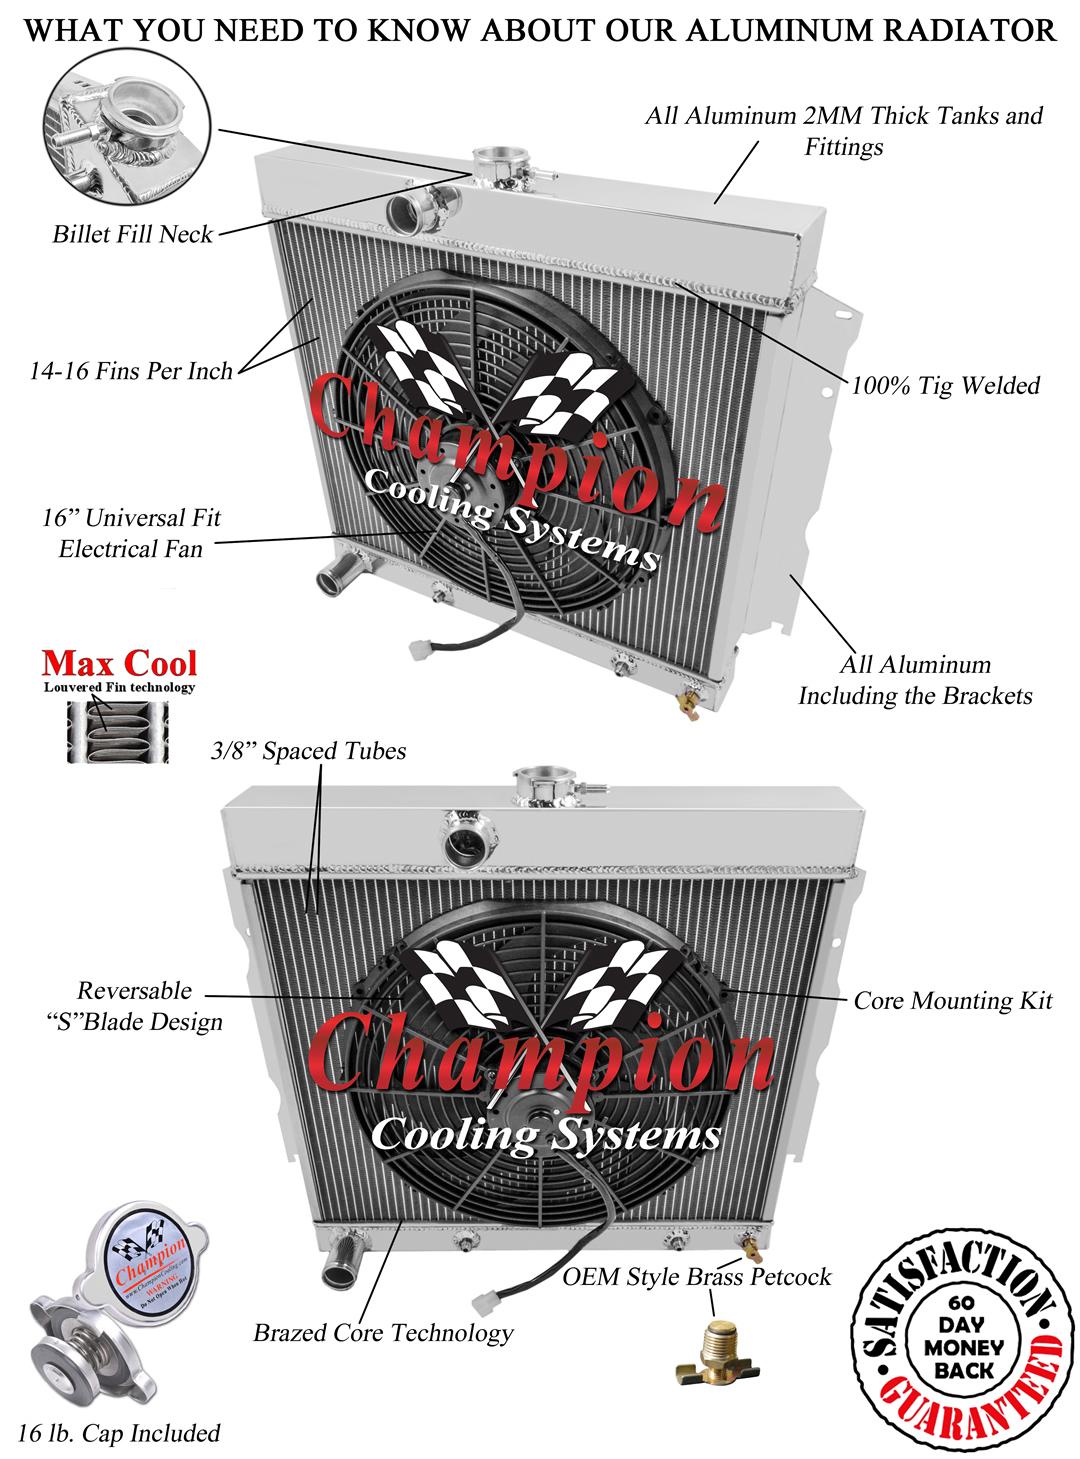 1966 22 Inch Dart 3 Row Champion Alum Radiator Fan Combo Radiators Wiring Diagram Will Cool Up To 650 Hp